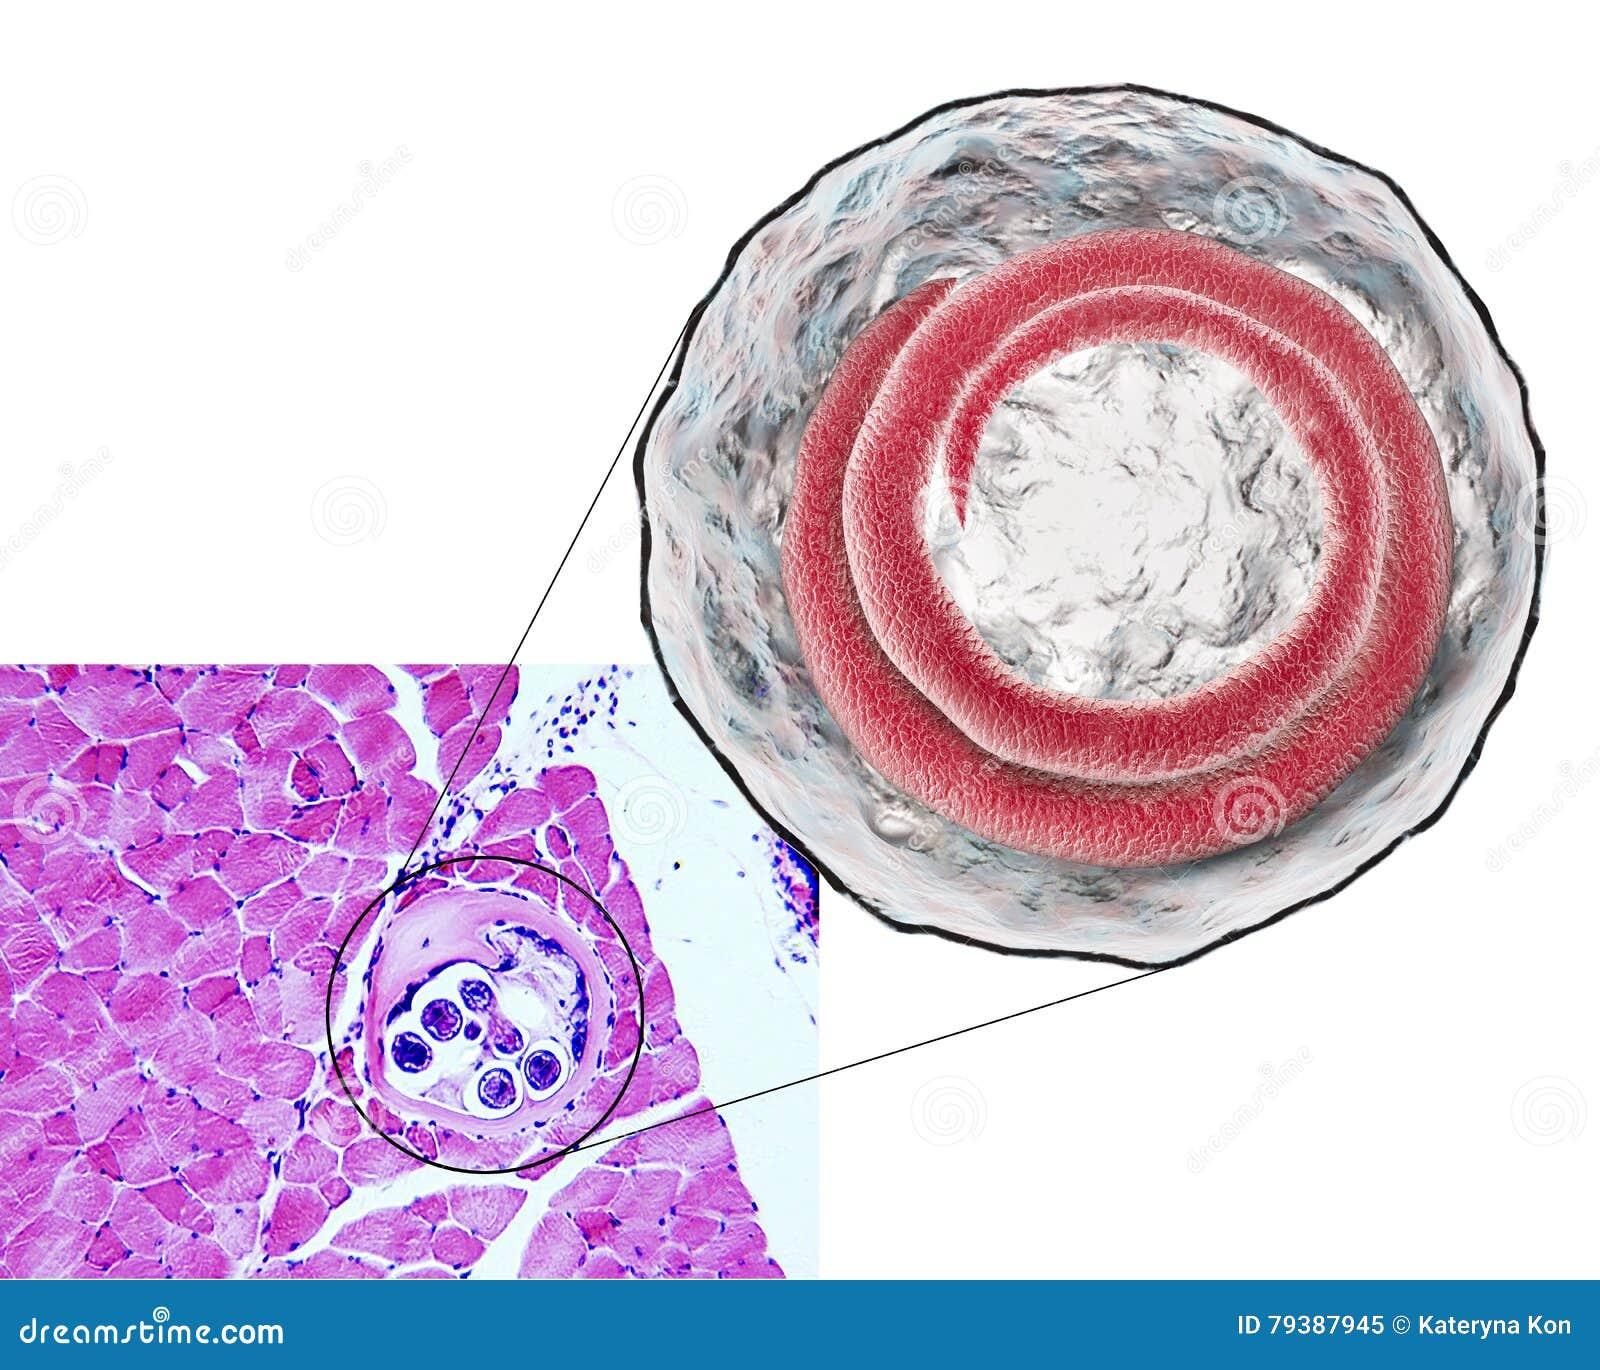 helminth trichinosis)